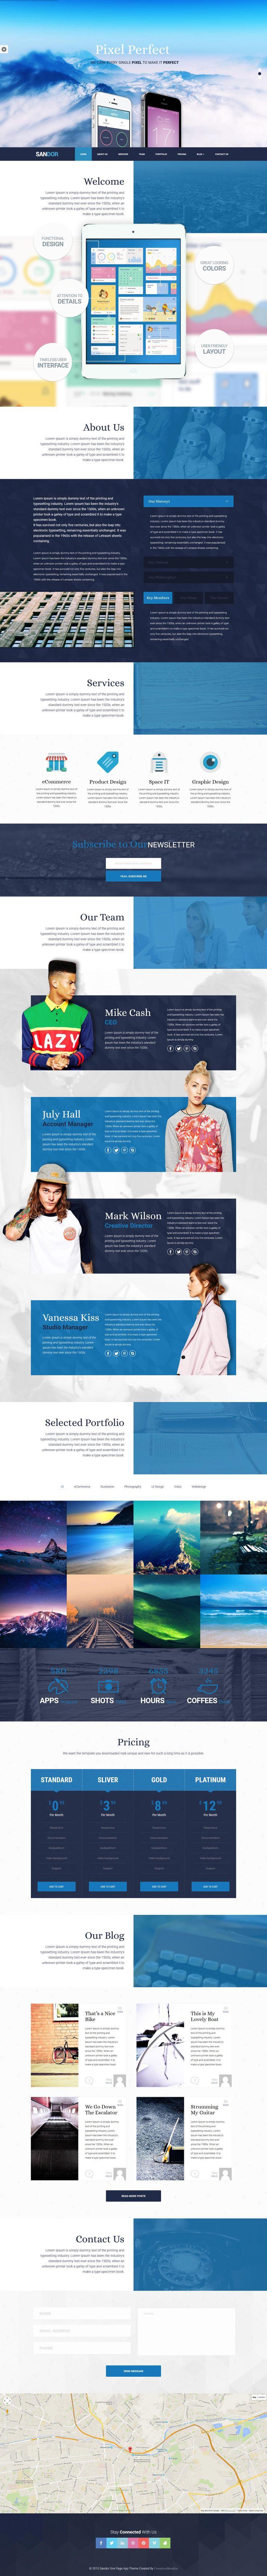 Sandor WordPress Theme - Design Drips